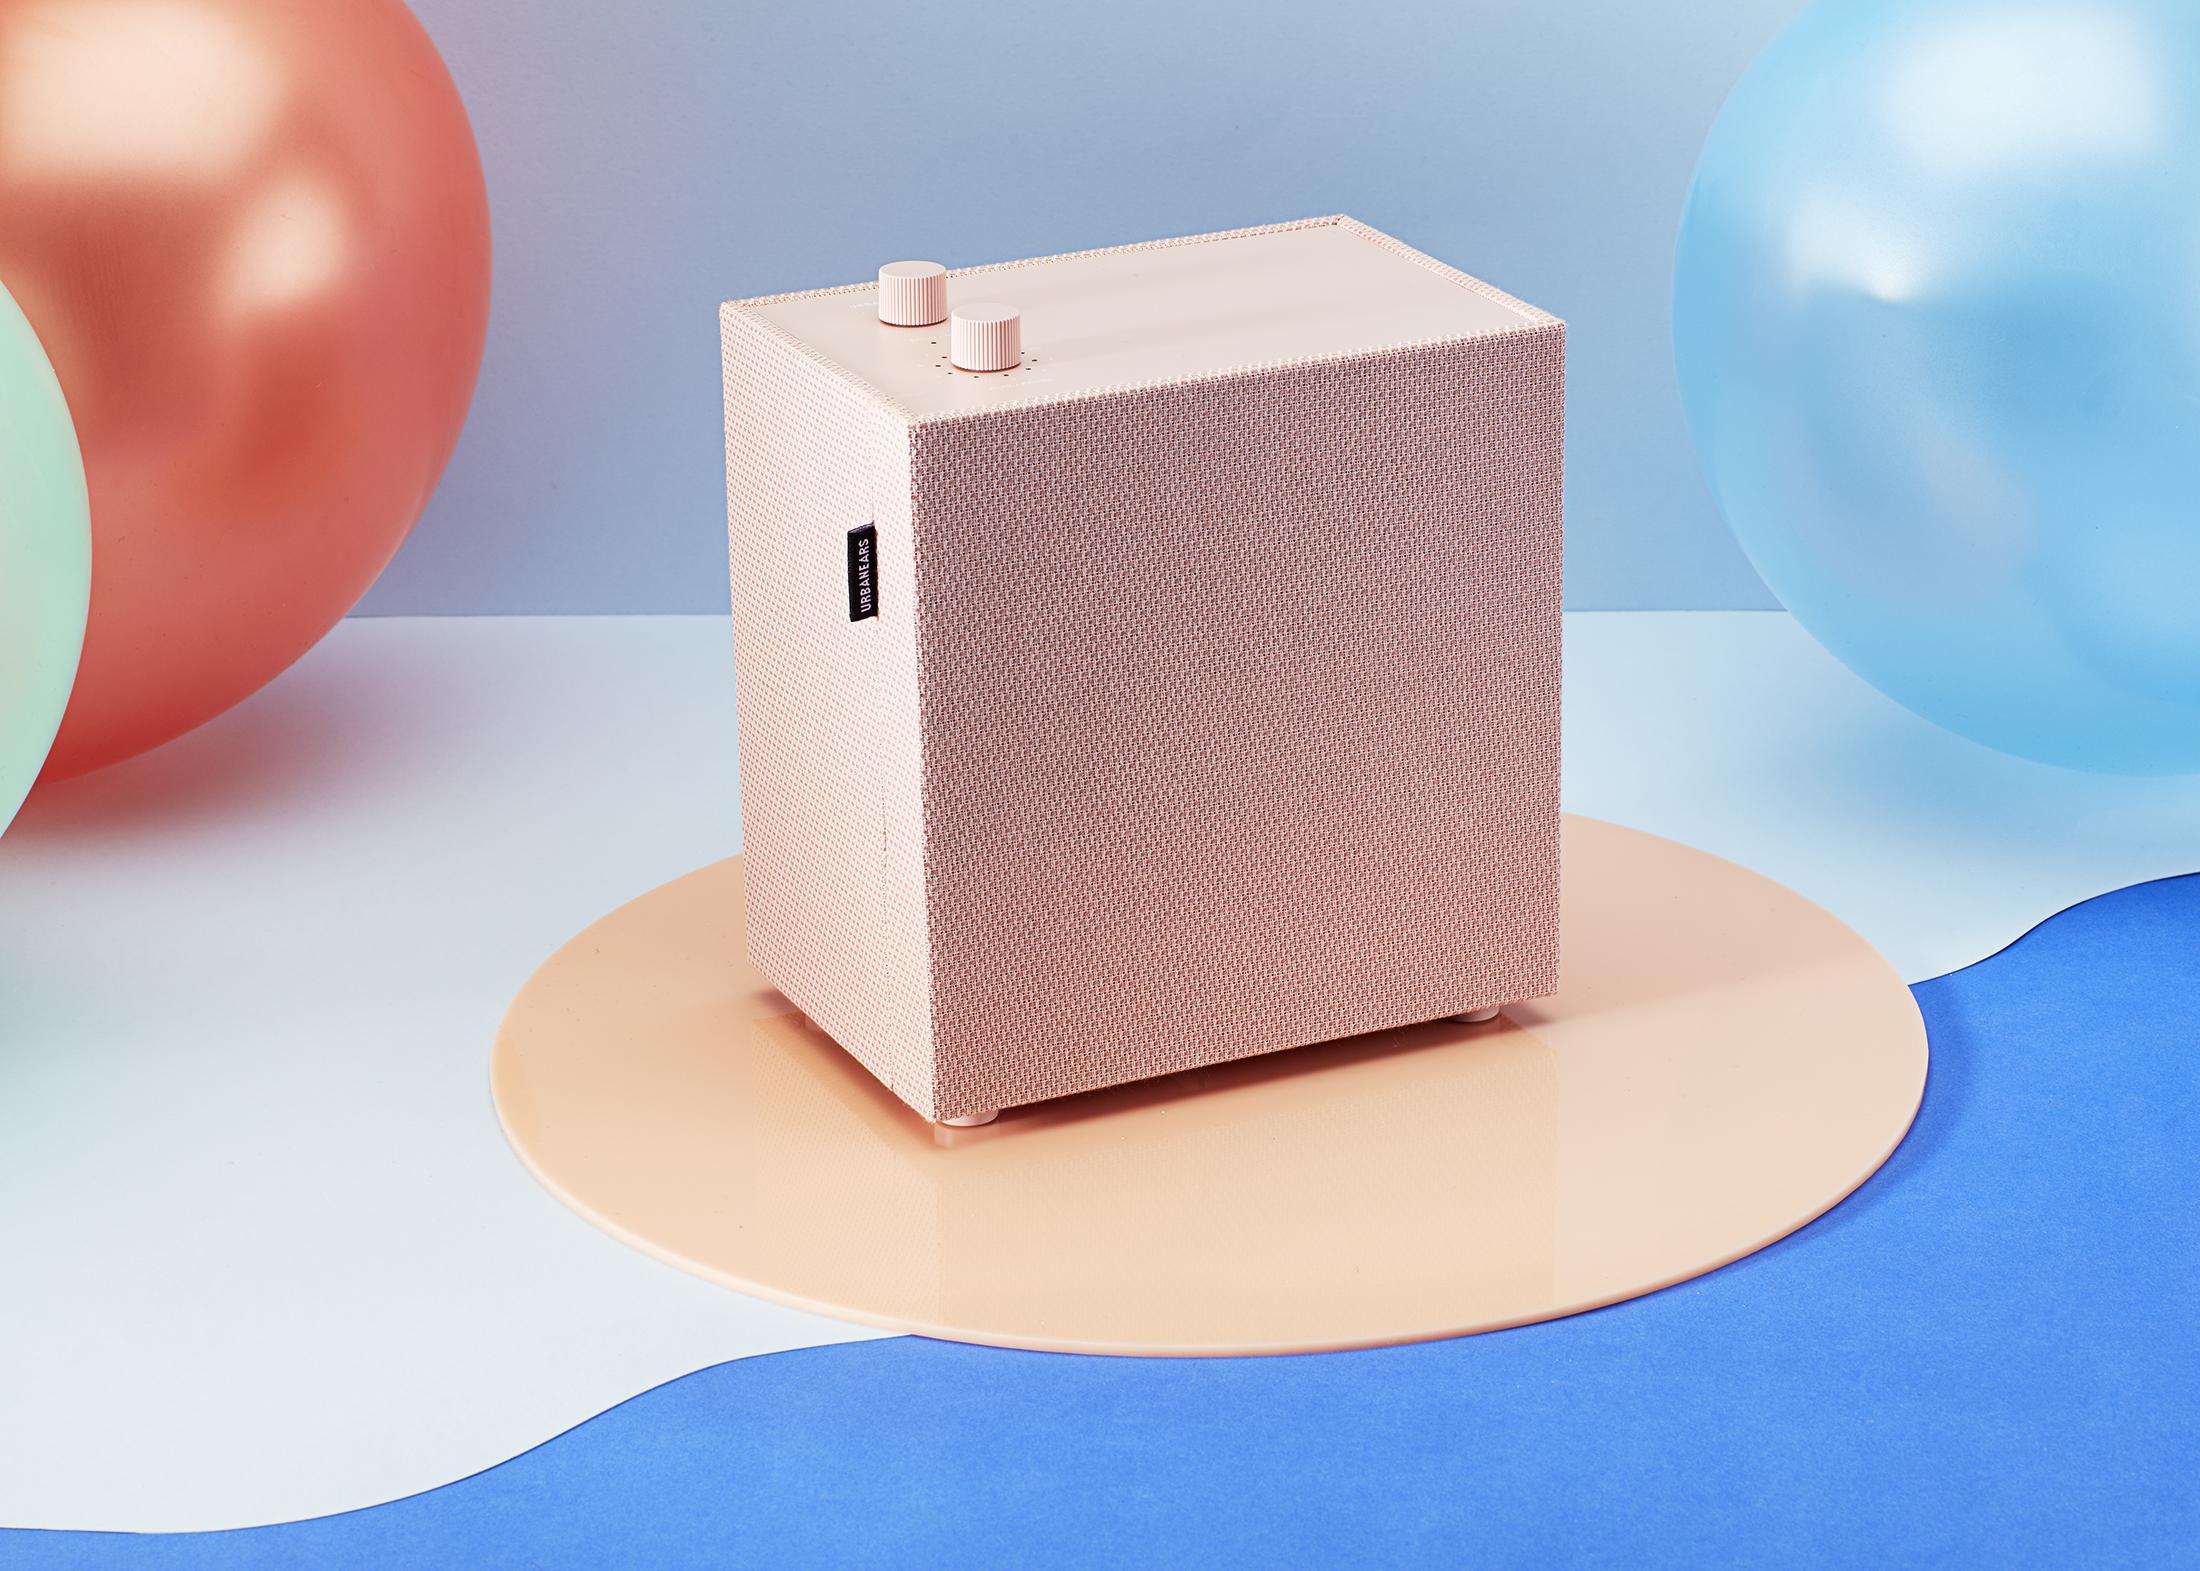 Product: Lotsen Speaker